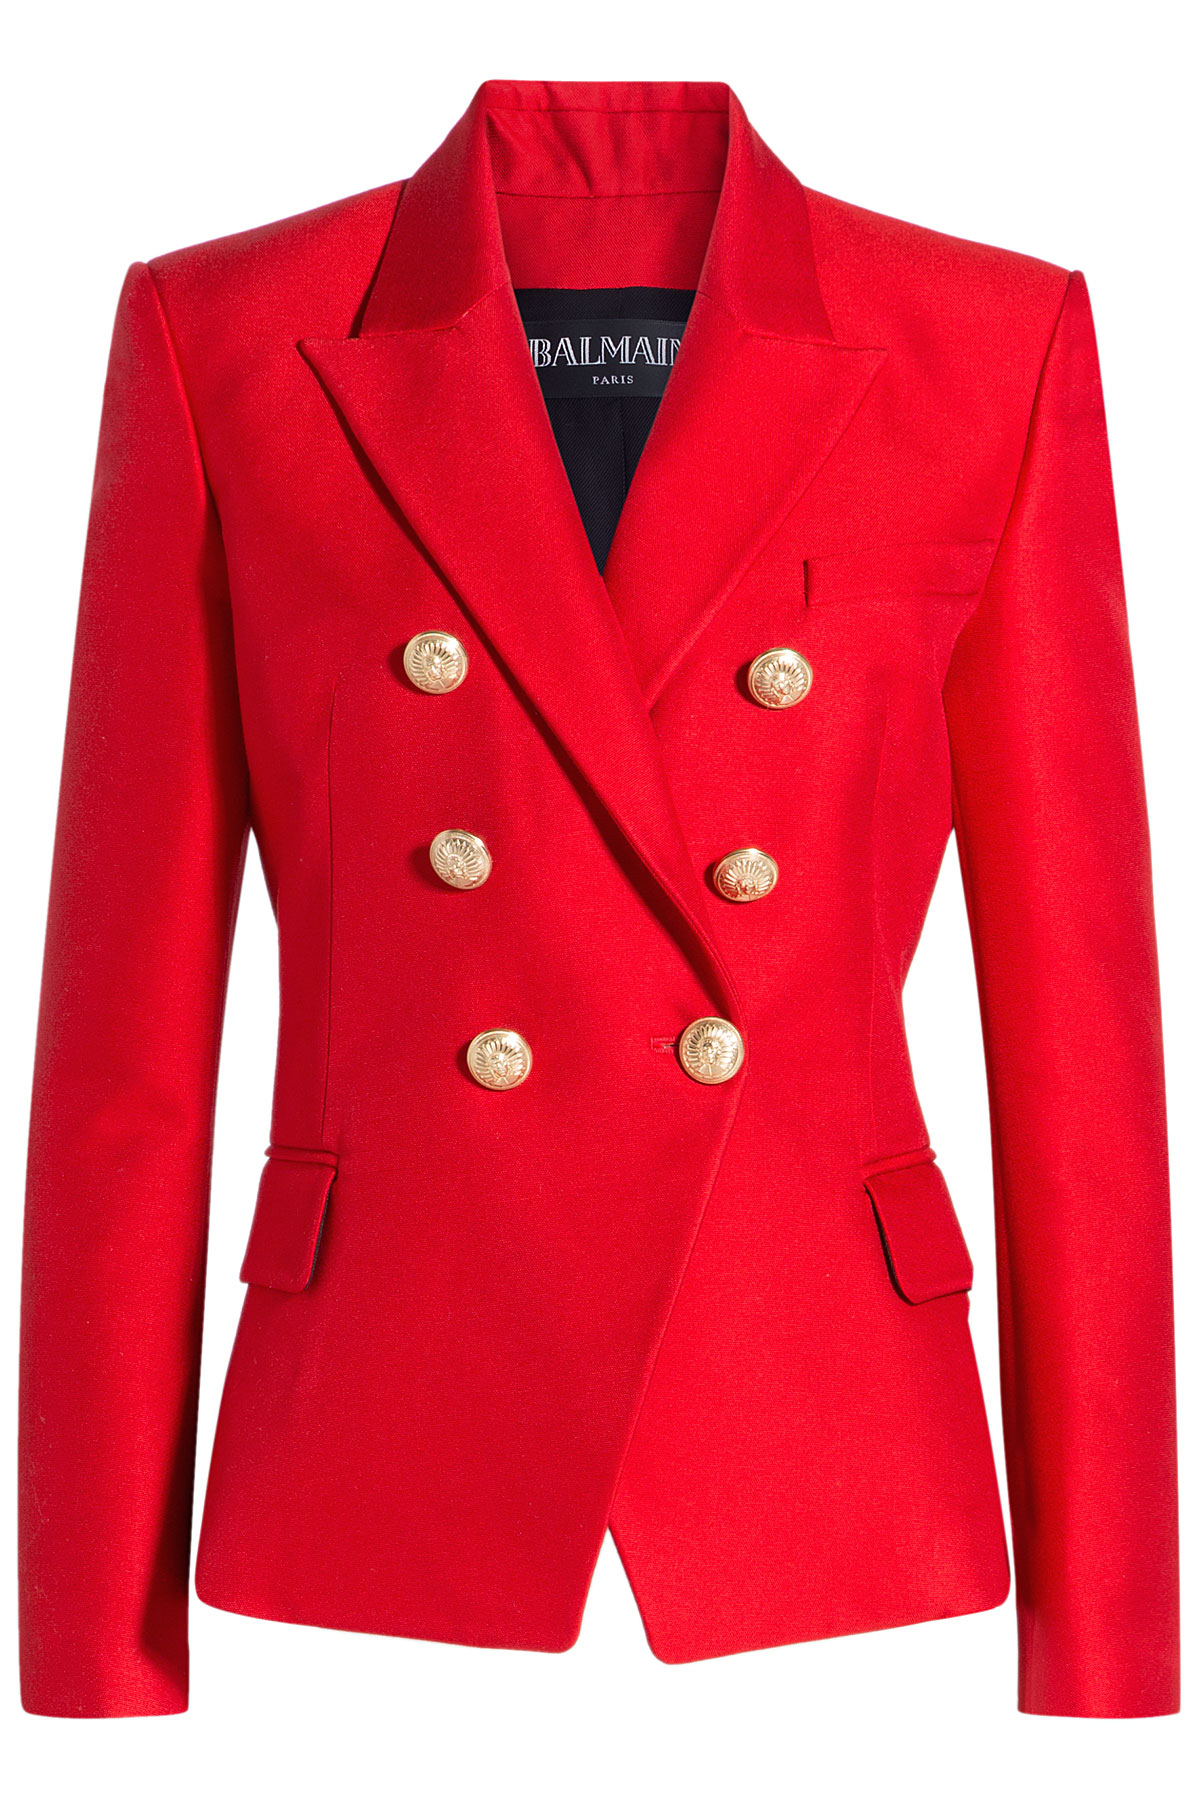 balmain-bold-shoulder-blazer-red-product